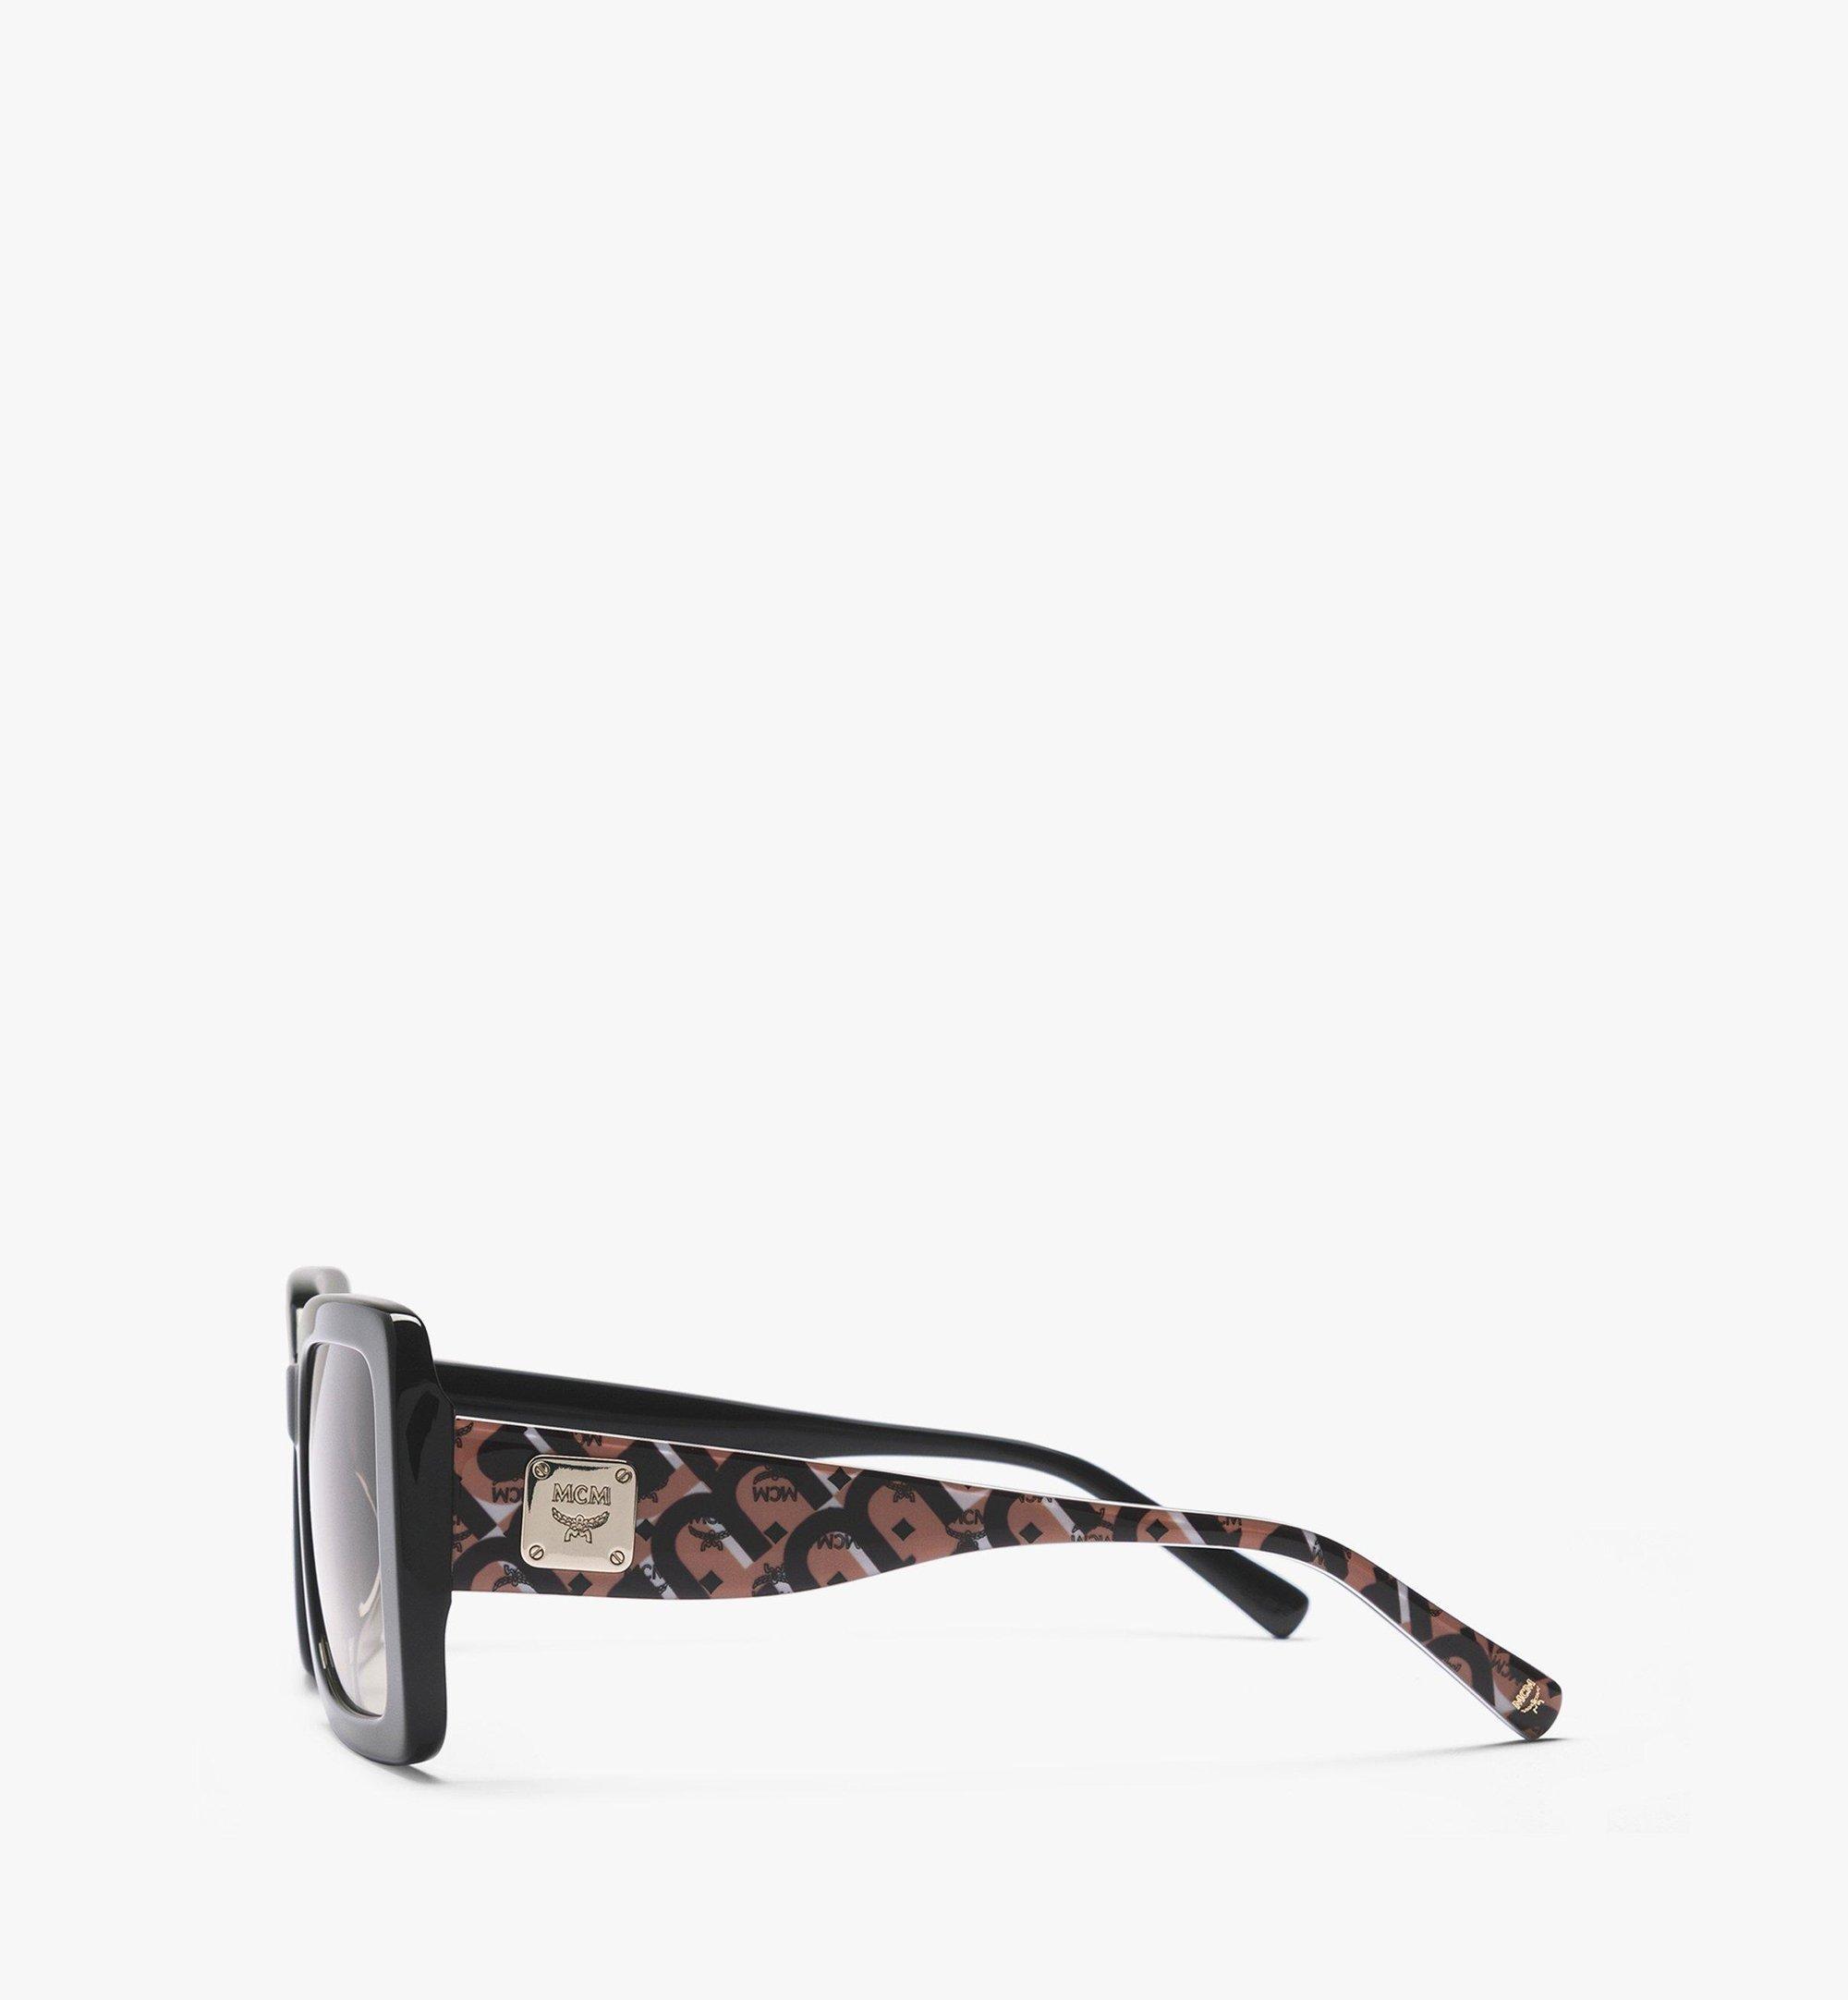 MCM MCM711S Rectangular Sunglasses Black MEGBAMM07BK001 Alternate View 1